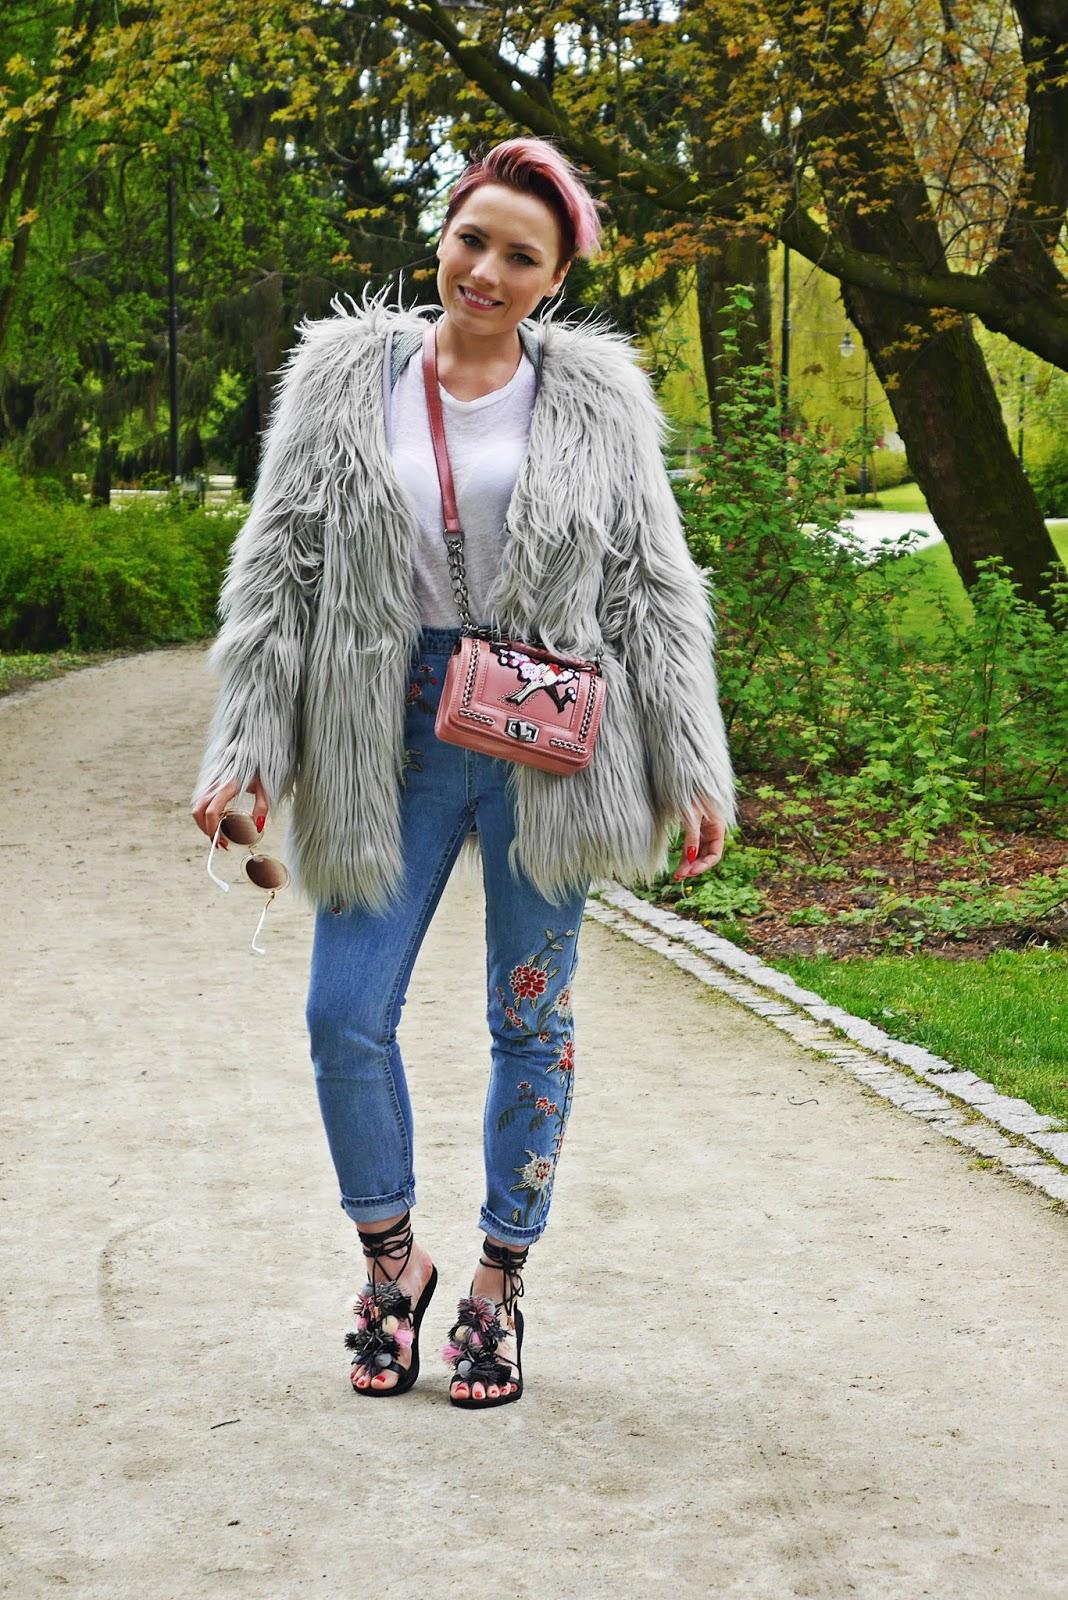 pompon_sandals_dresslily_ootd_look_karyn_blog_gray_fur_mama_jeans_020517c